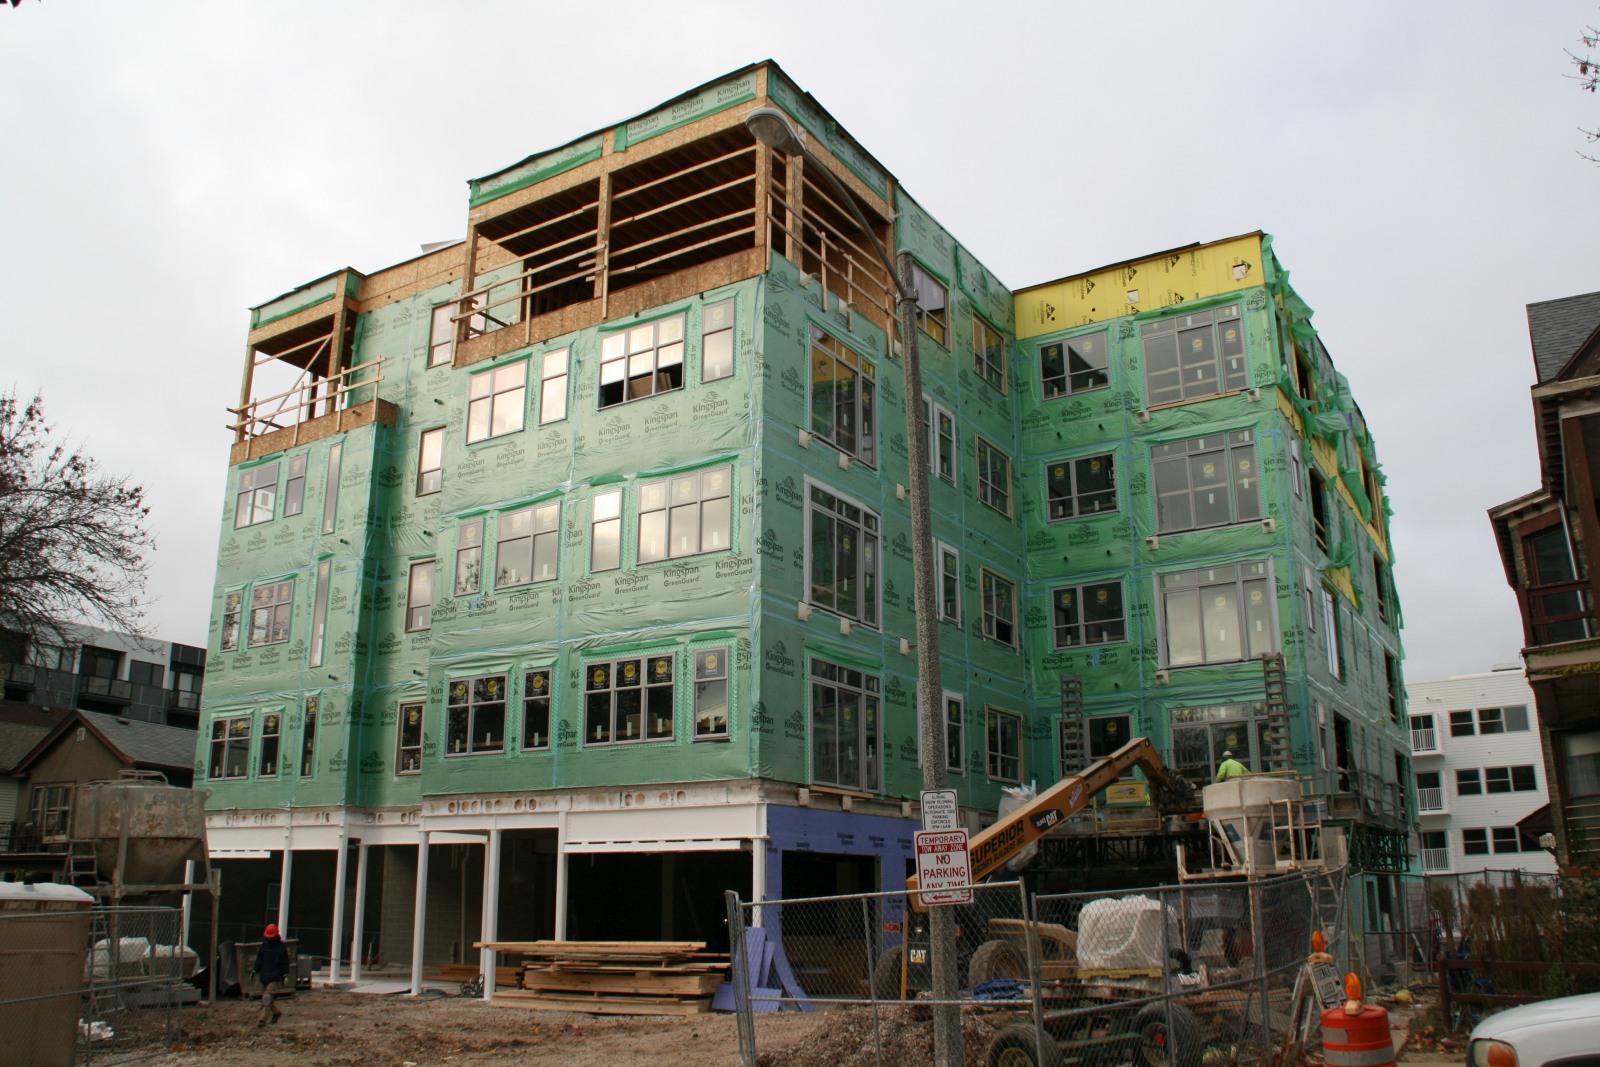 1627 N. Jackson St. Construction